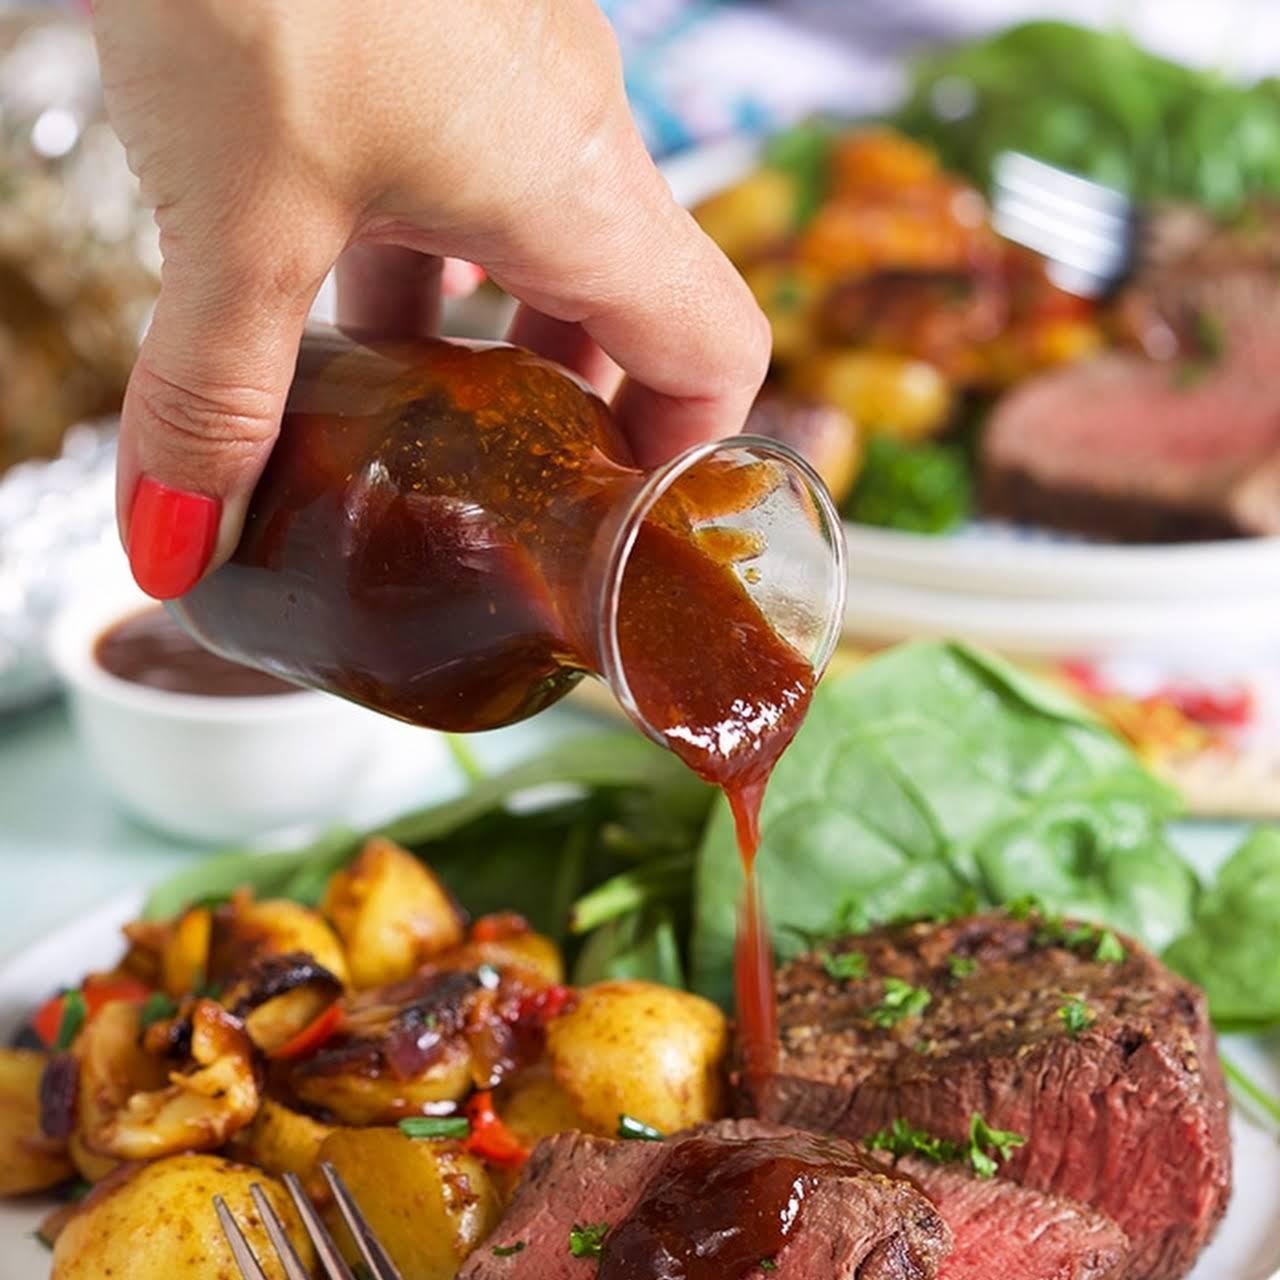 10 Best Steak Sauce For Fillet Steak Recipes Yummly